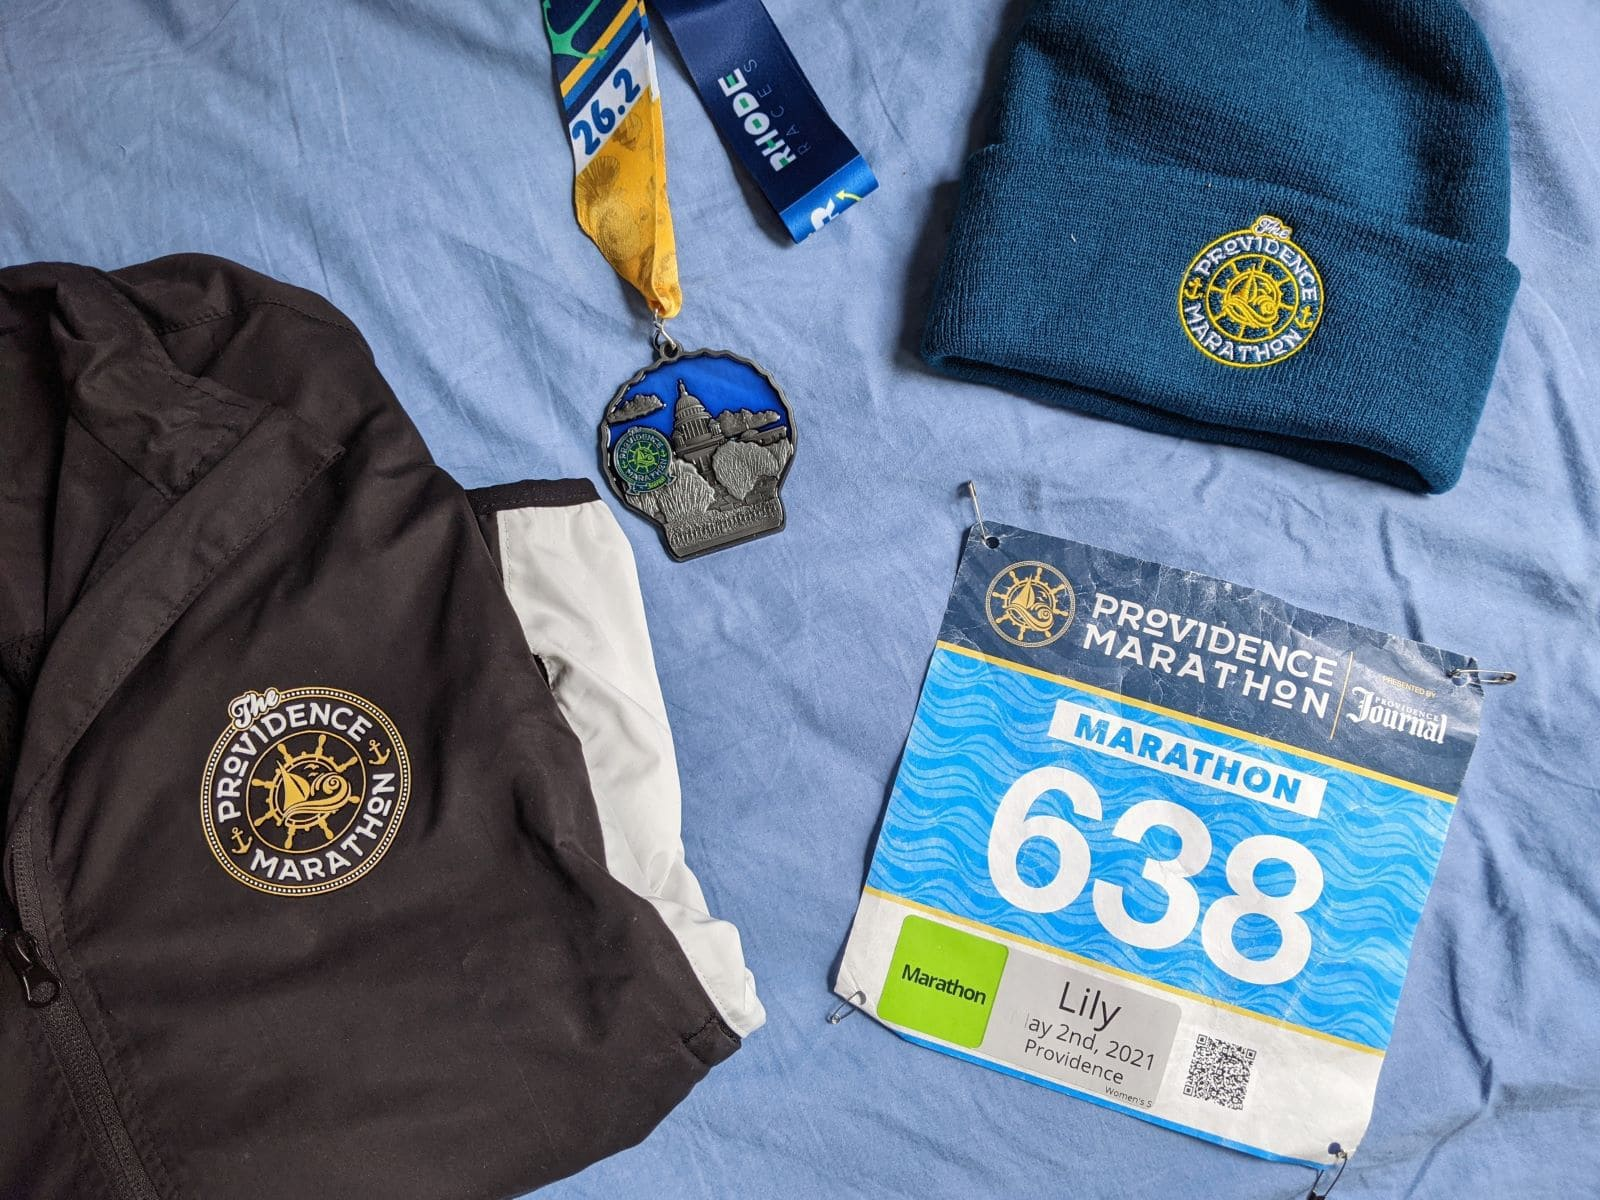 Providence Marathon medal, jacket, and beanie